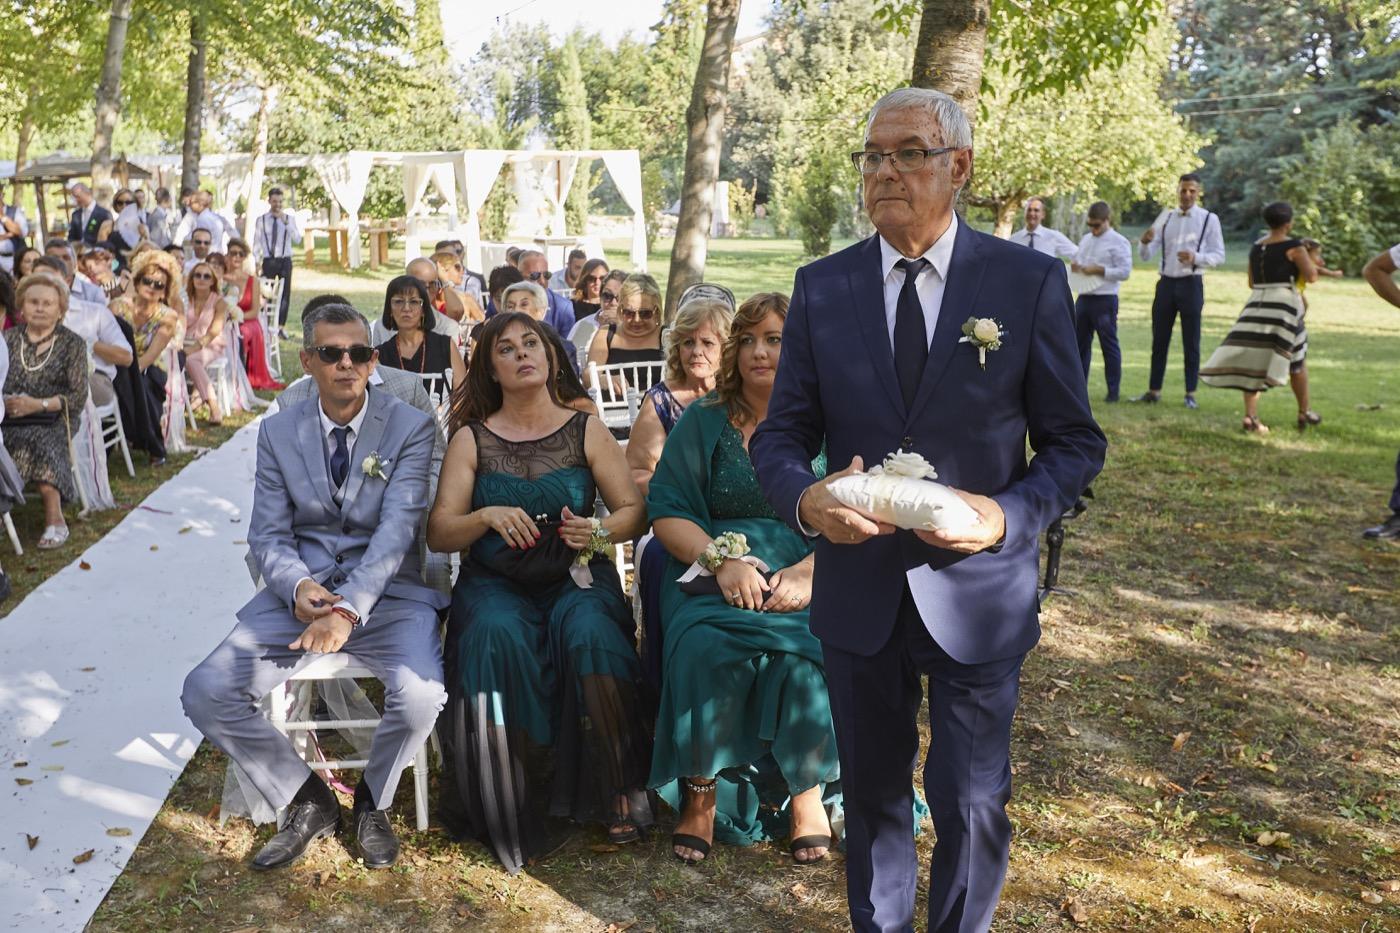 Claudio-Coppola-wedding-photographer-la-scuderia-eventi-preparativi-la-rosetta-perugia-55